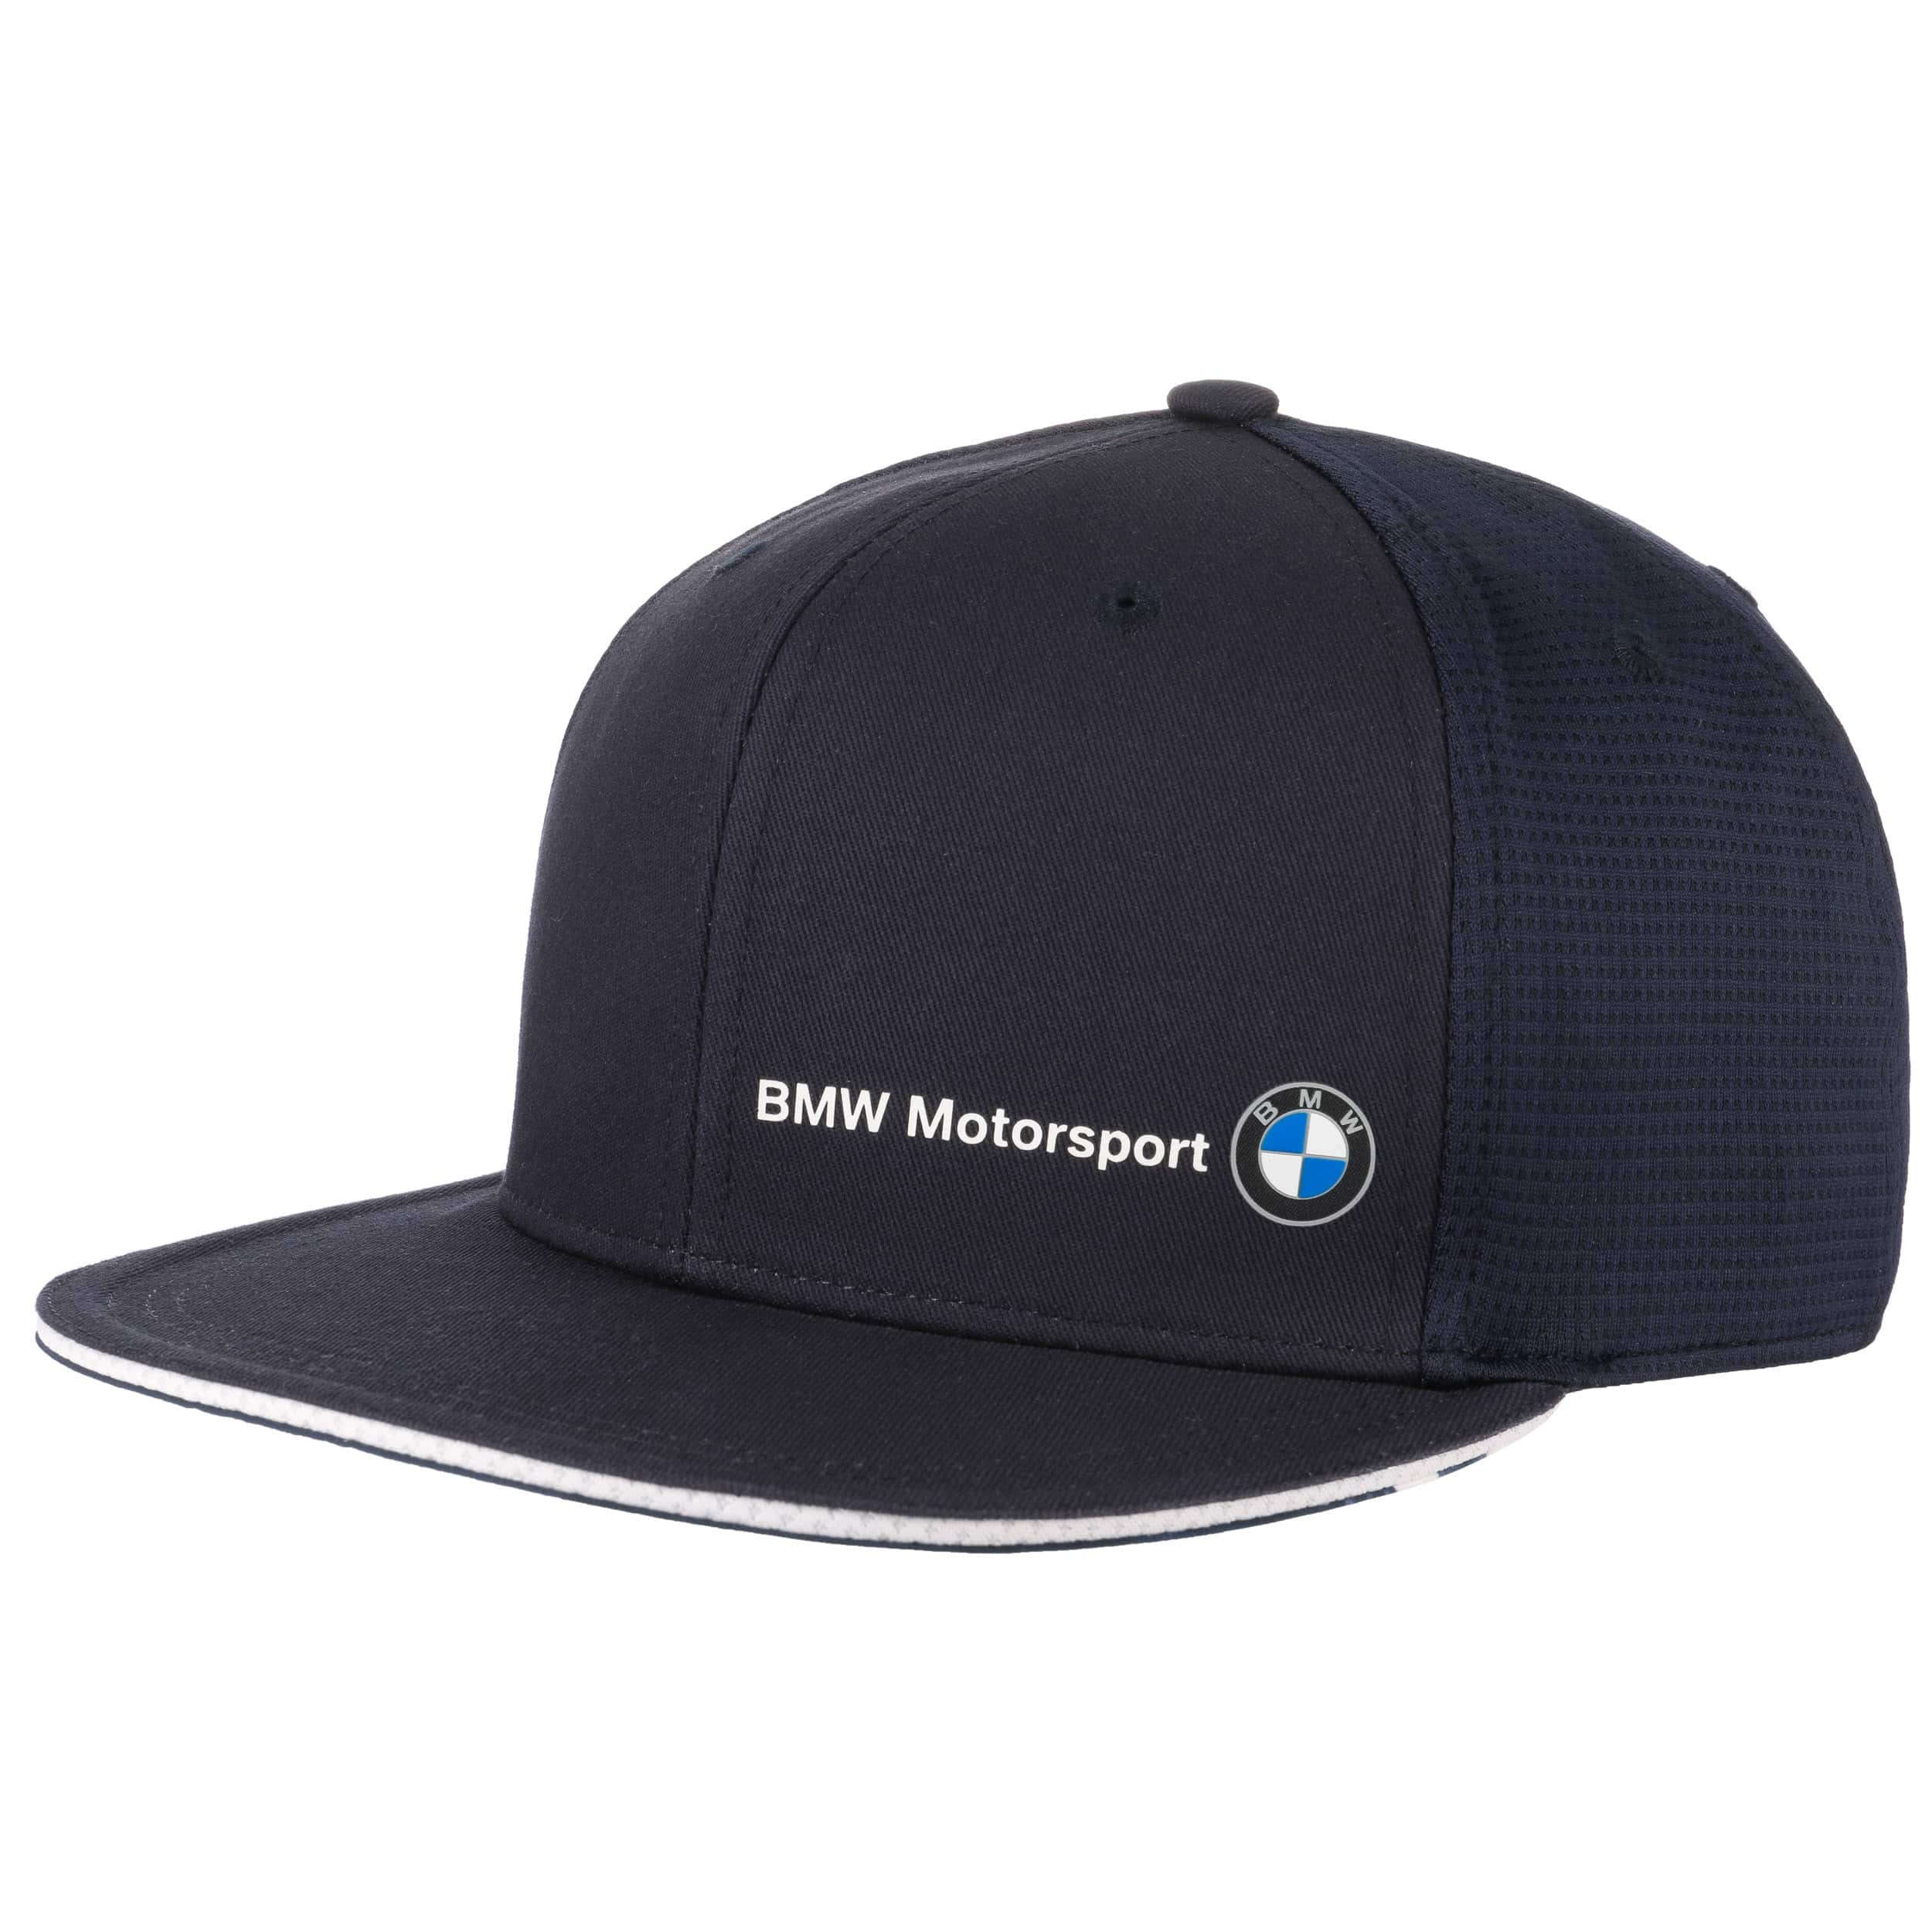 14ac050130d7d Gorra Plana BMW Motorsport by PUMA - Gorras - sombreroshop.es